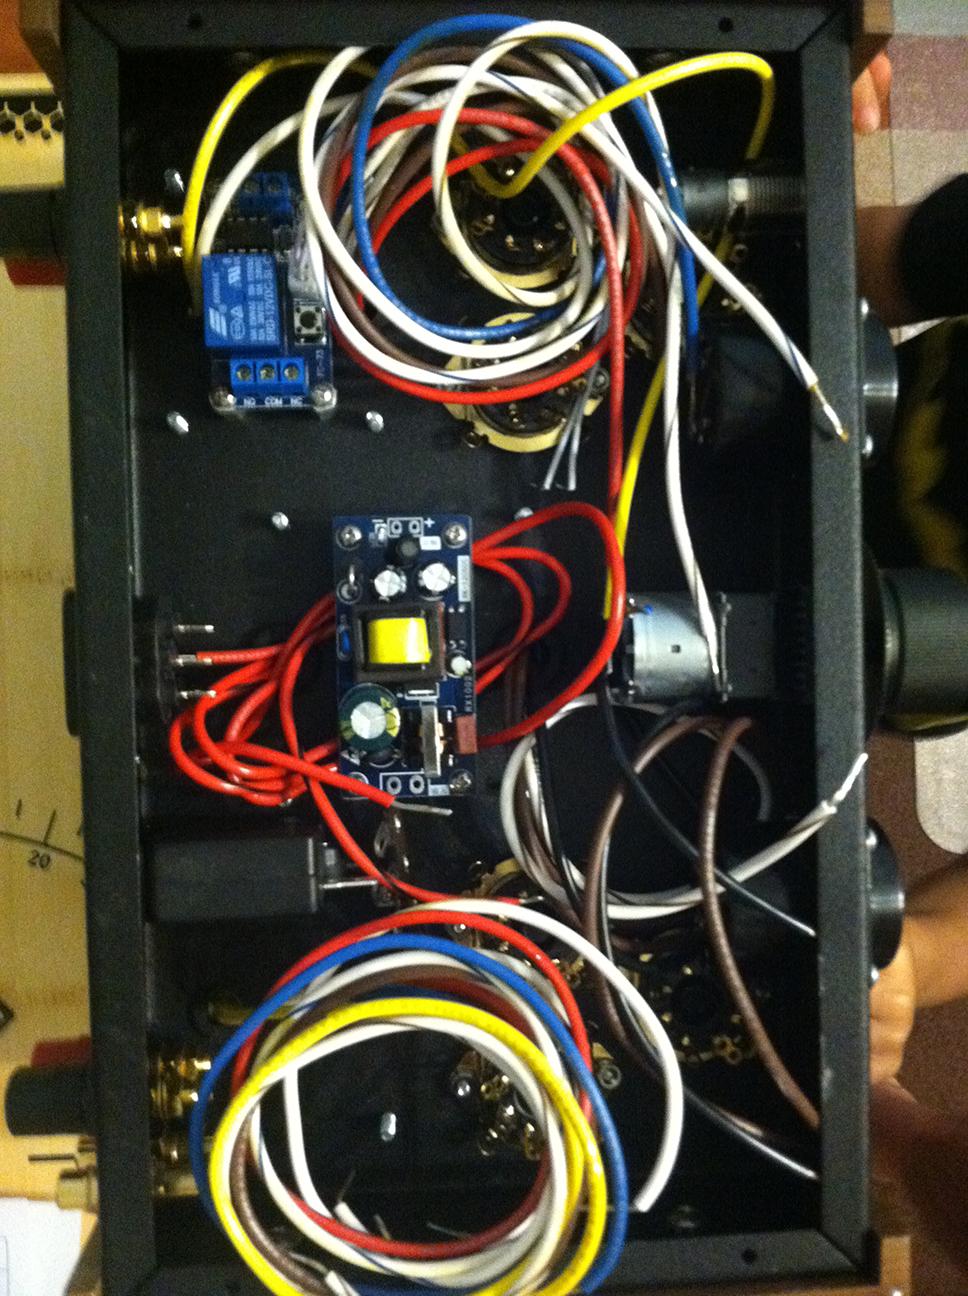 medium resolution of 10w executive tube amplifier parts express project gallery craig j coley dmc 12 color wiring diagram